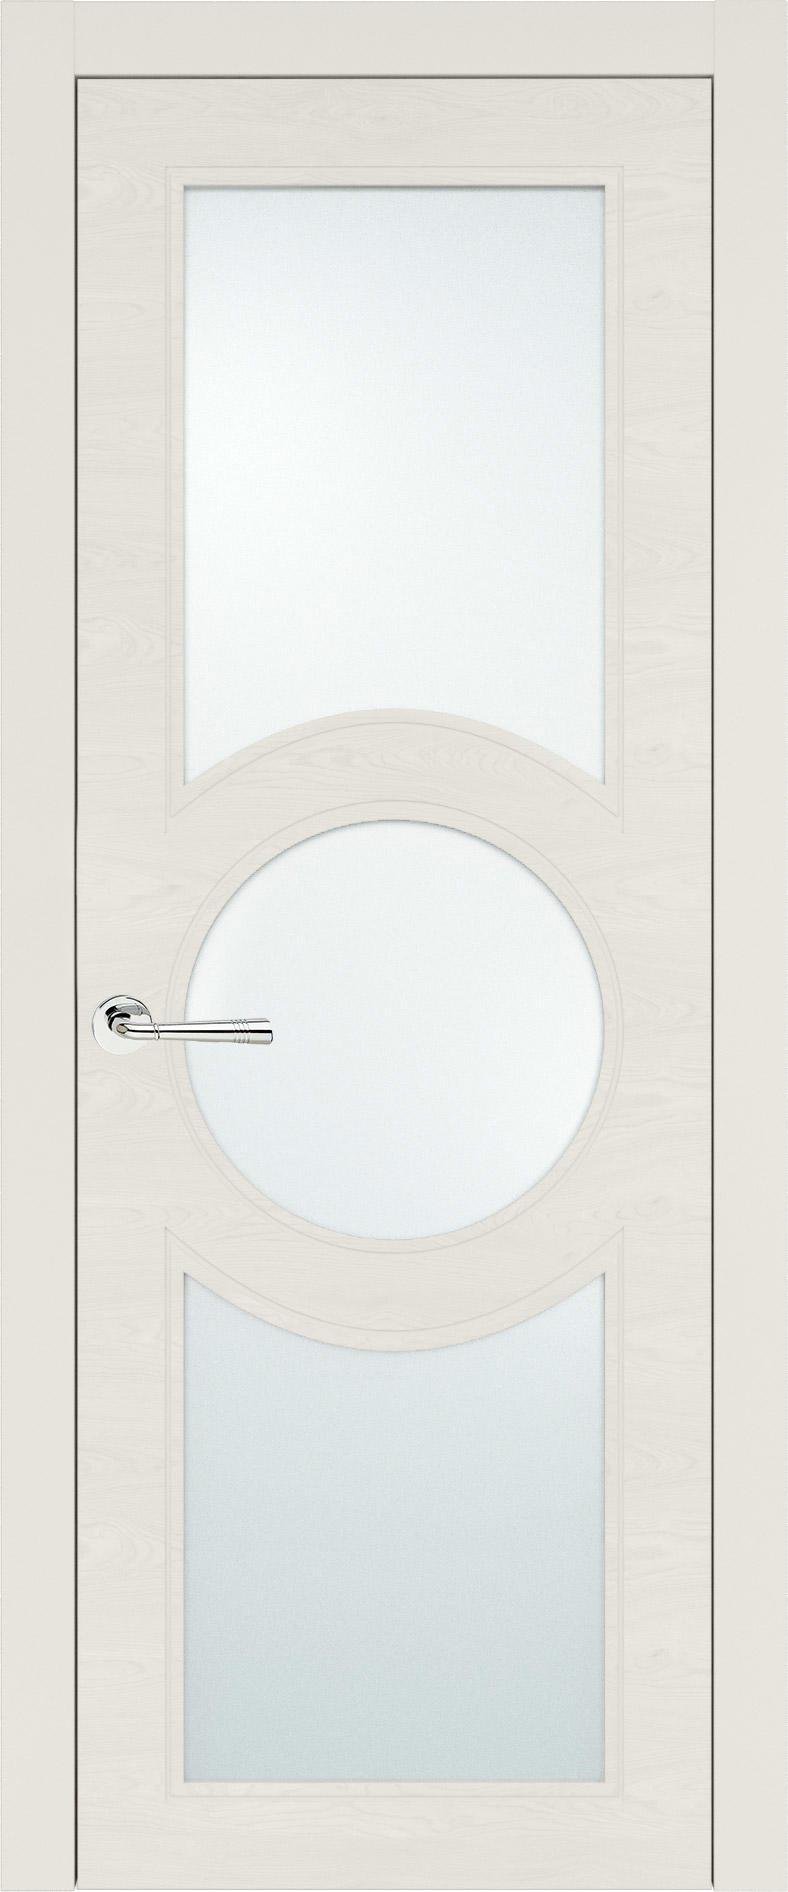 Ravenna Neo Classic цвет - Бежевая эмаль по шпону (RAL 9010) Со стеклом (ДО)